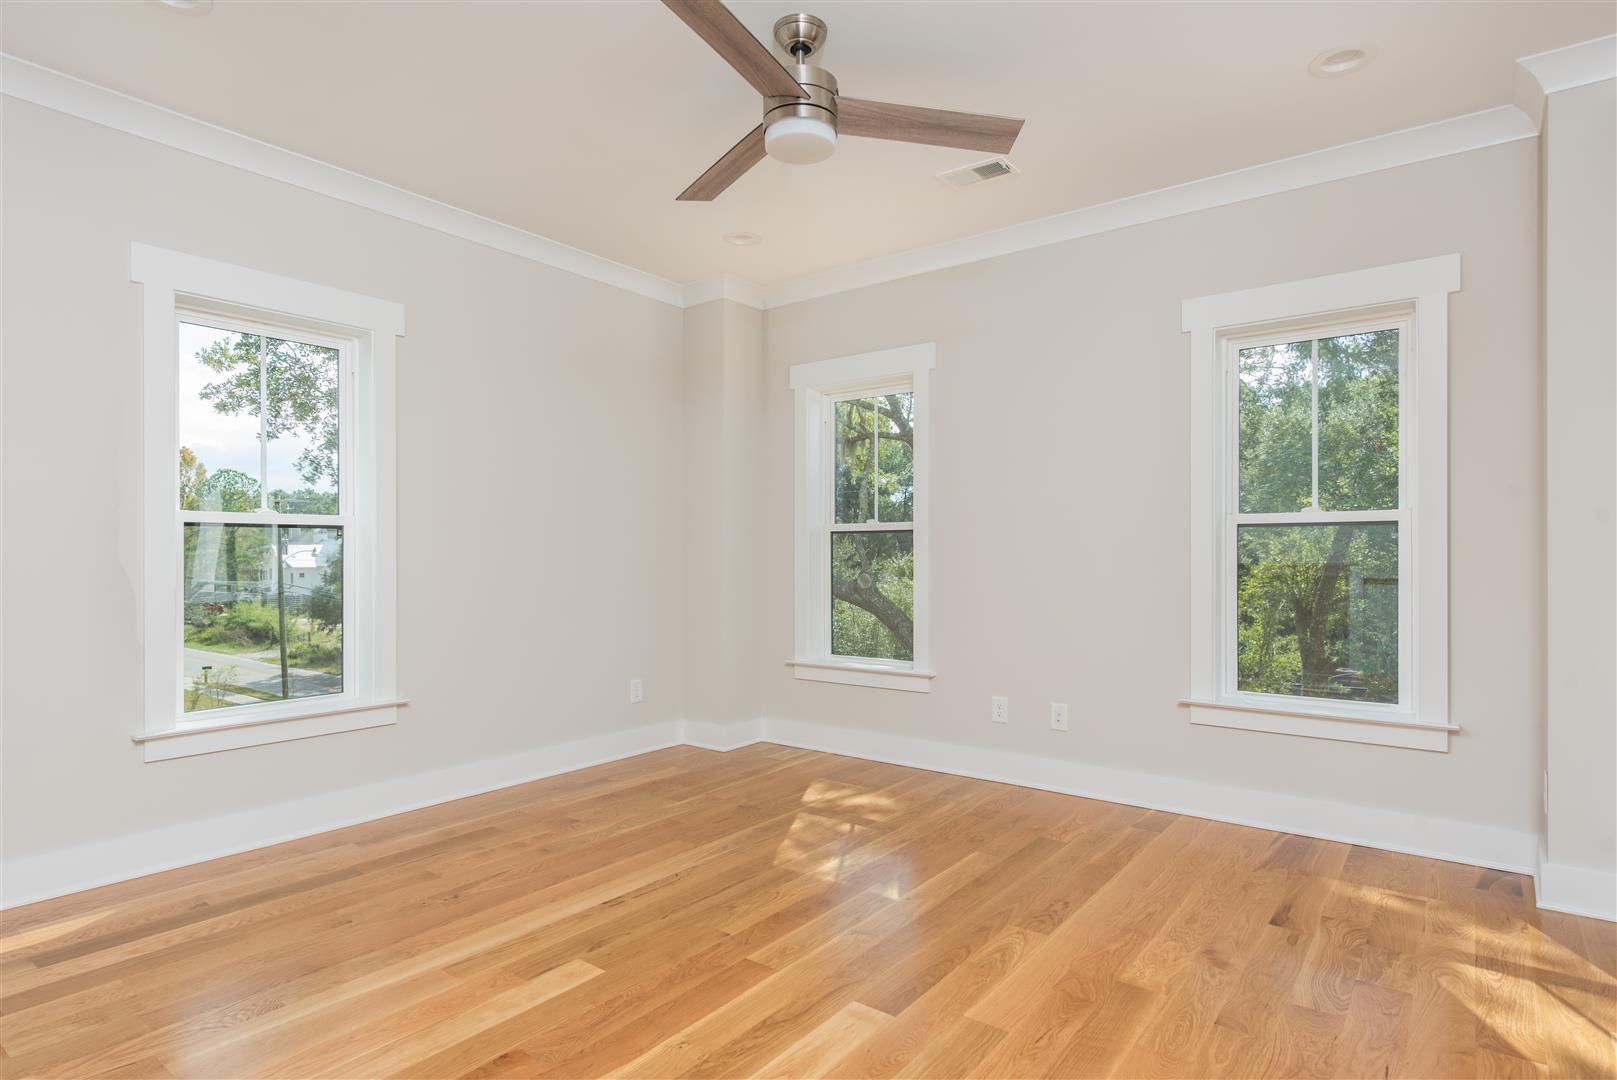 Scanlonville Homes For Sale - 160 5th, Mount Pleasant, SC - 5